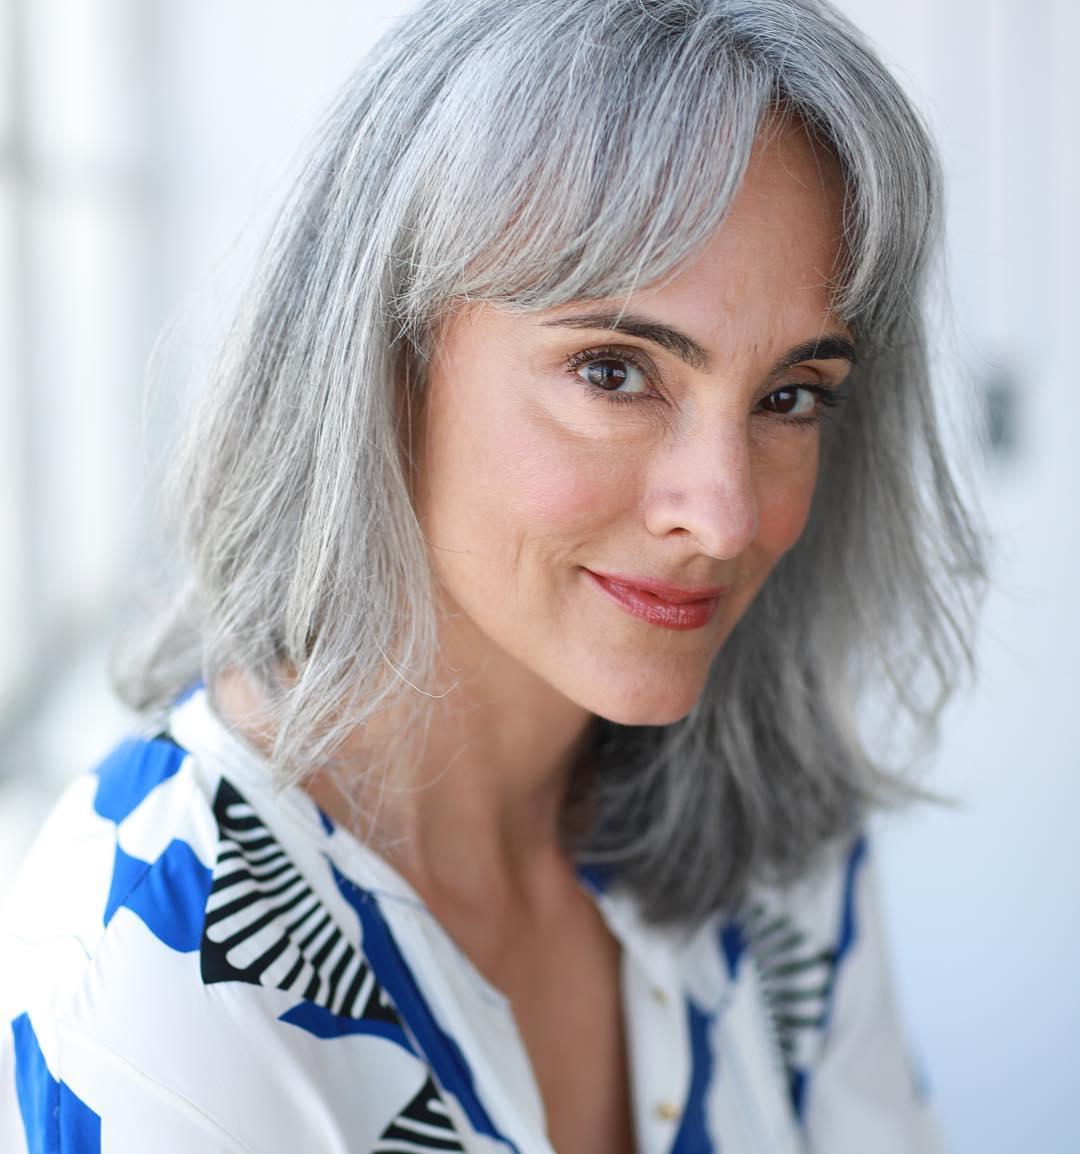 7 Fabulous Silver Hair Ideas And Why I Love My Gray Locks